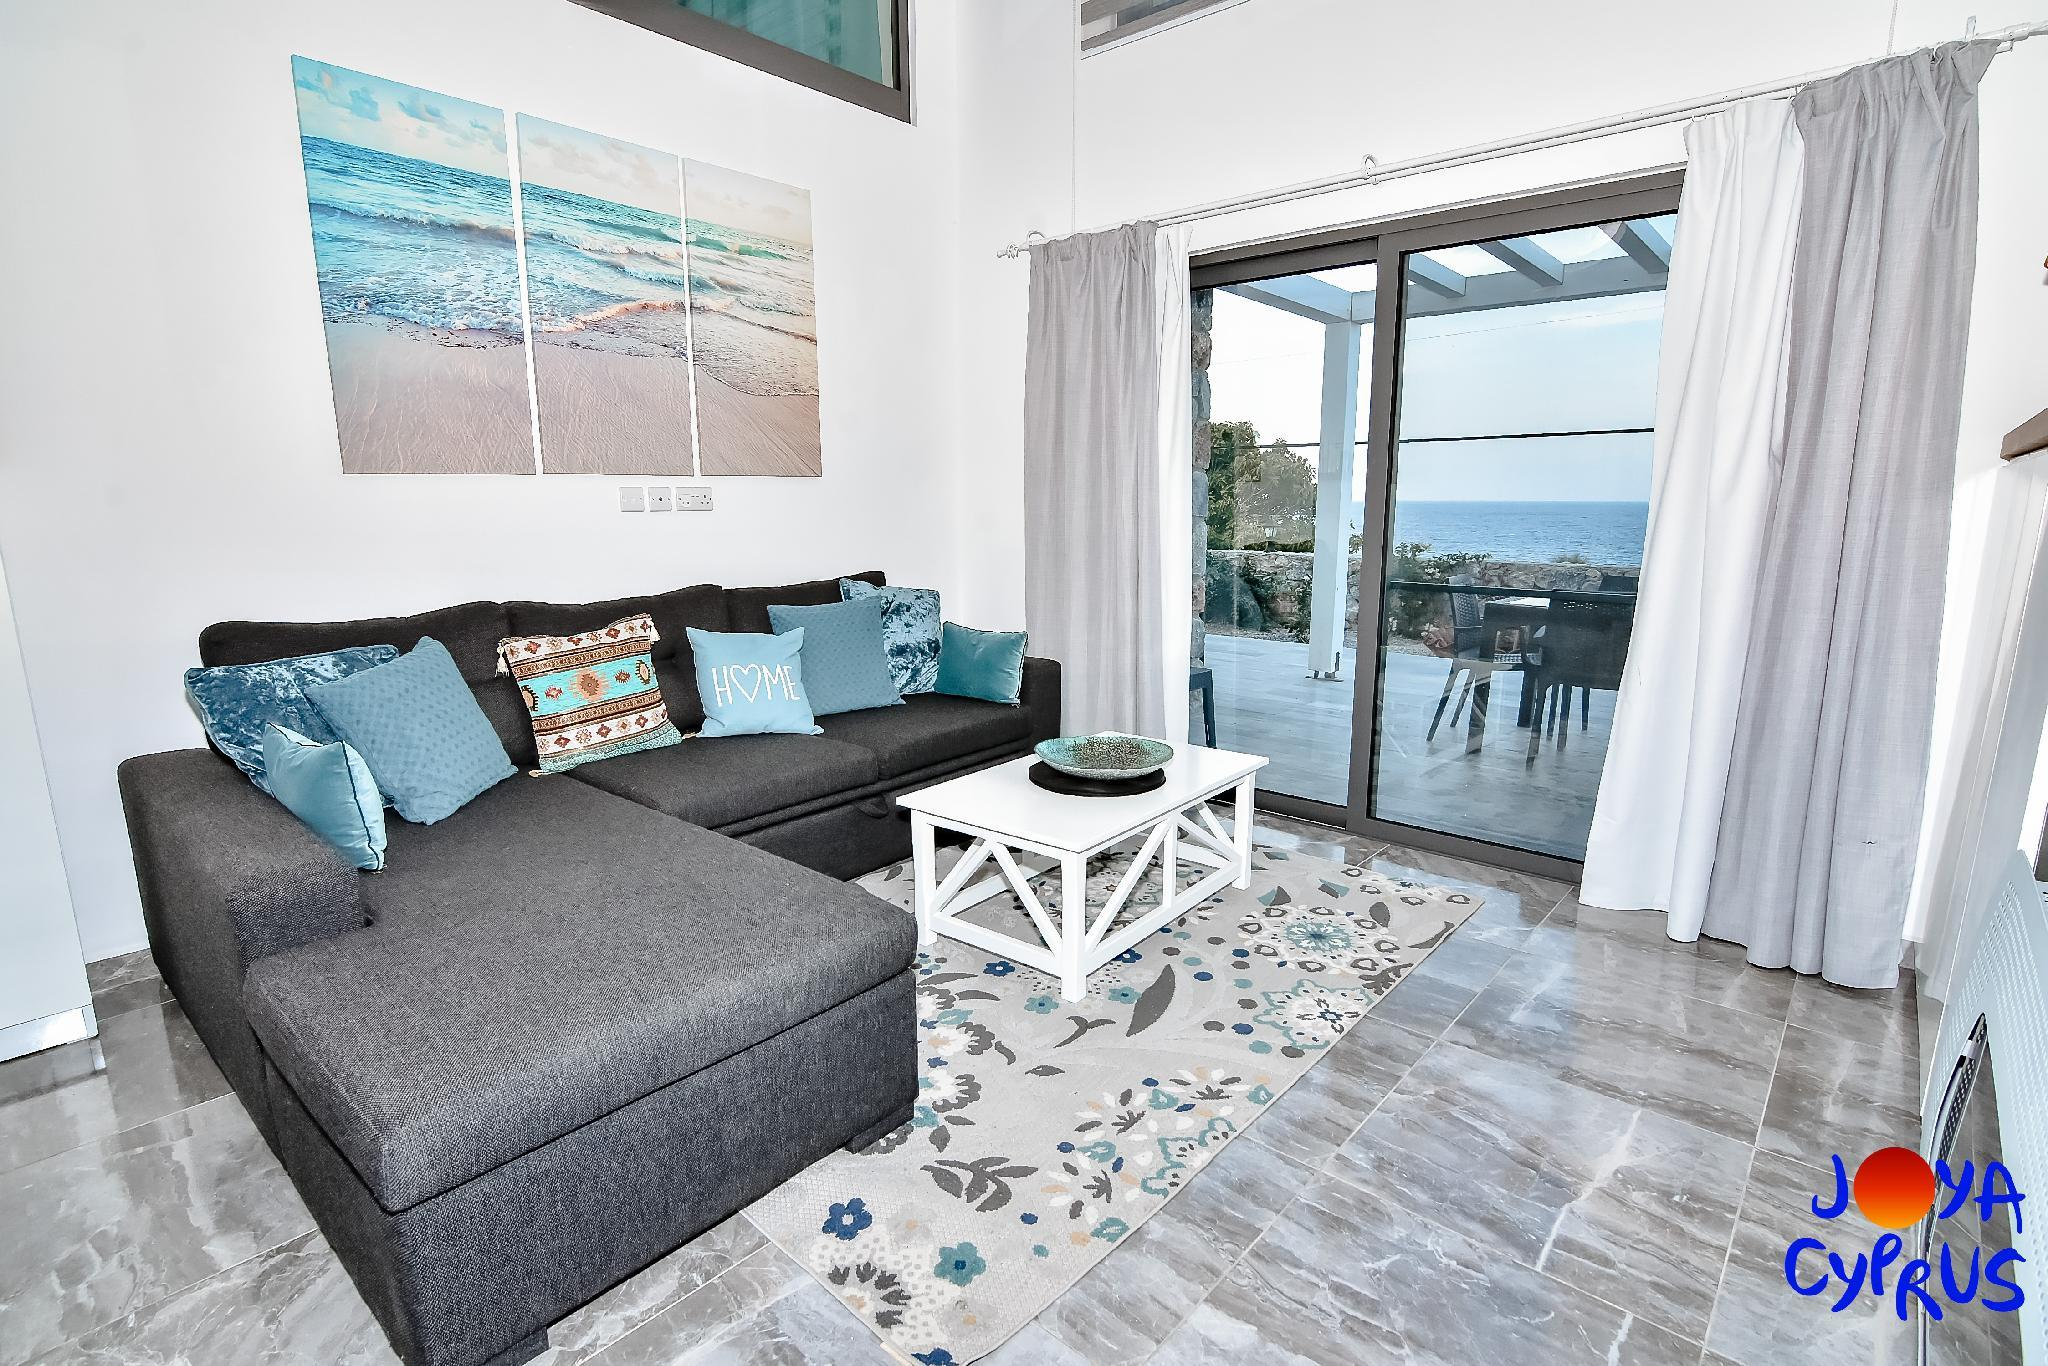 Joya Cyprus Sea View Garden Apartment